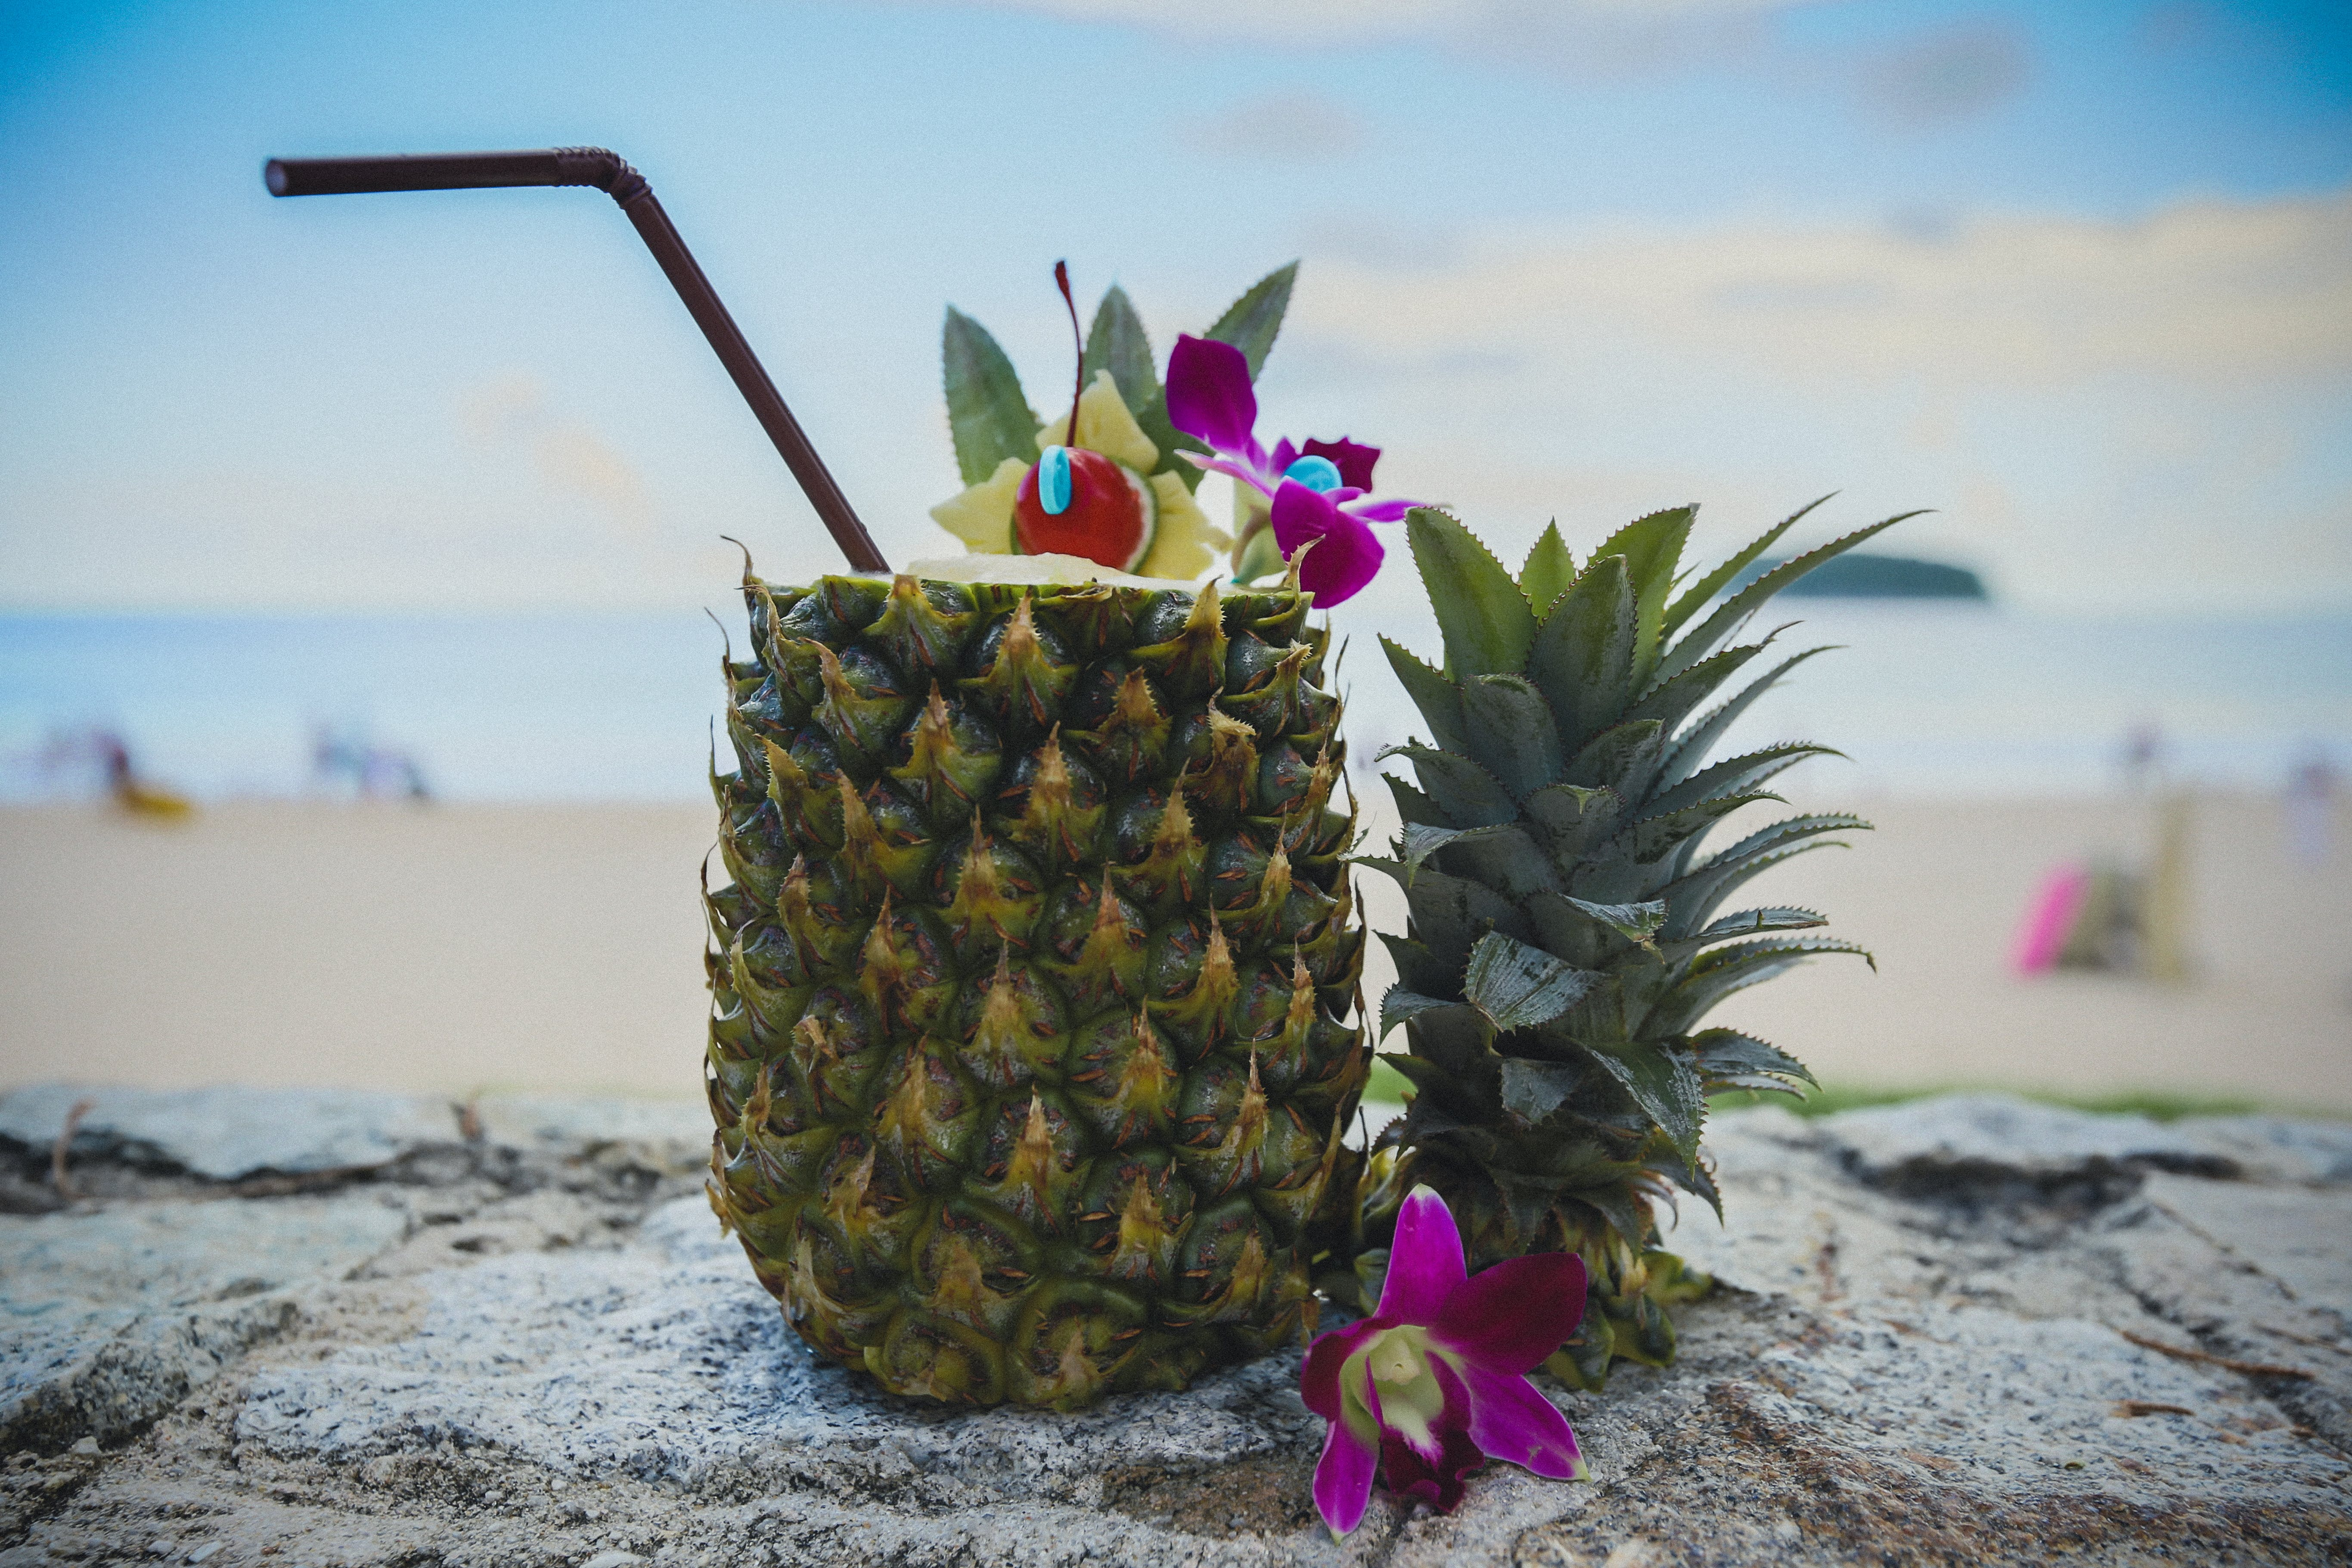 Pineapple Beside Pink Flower